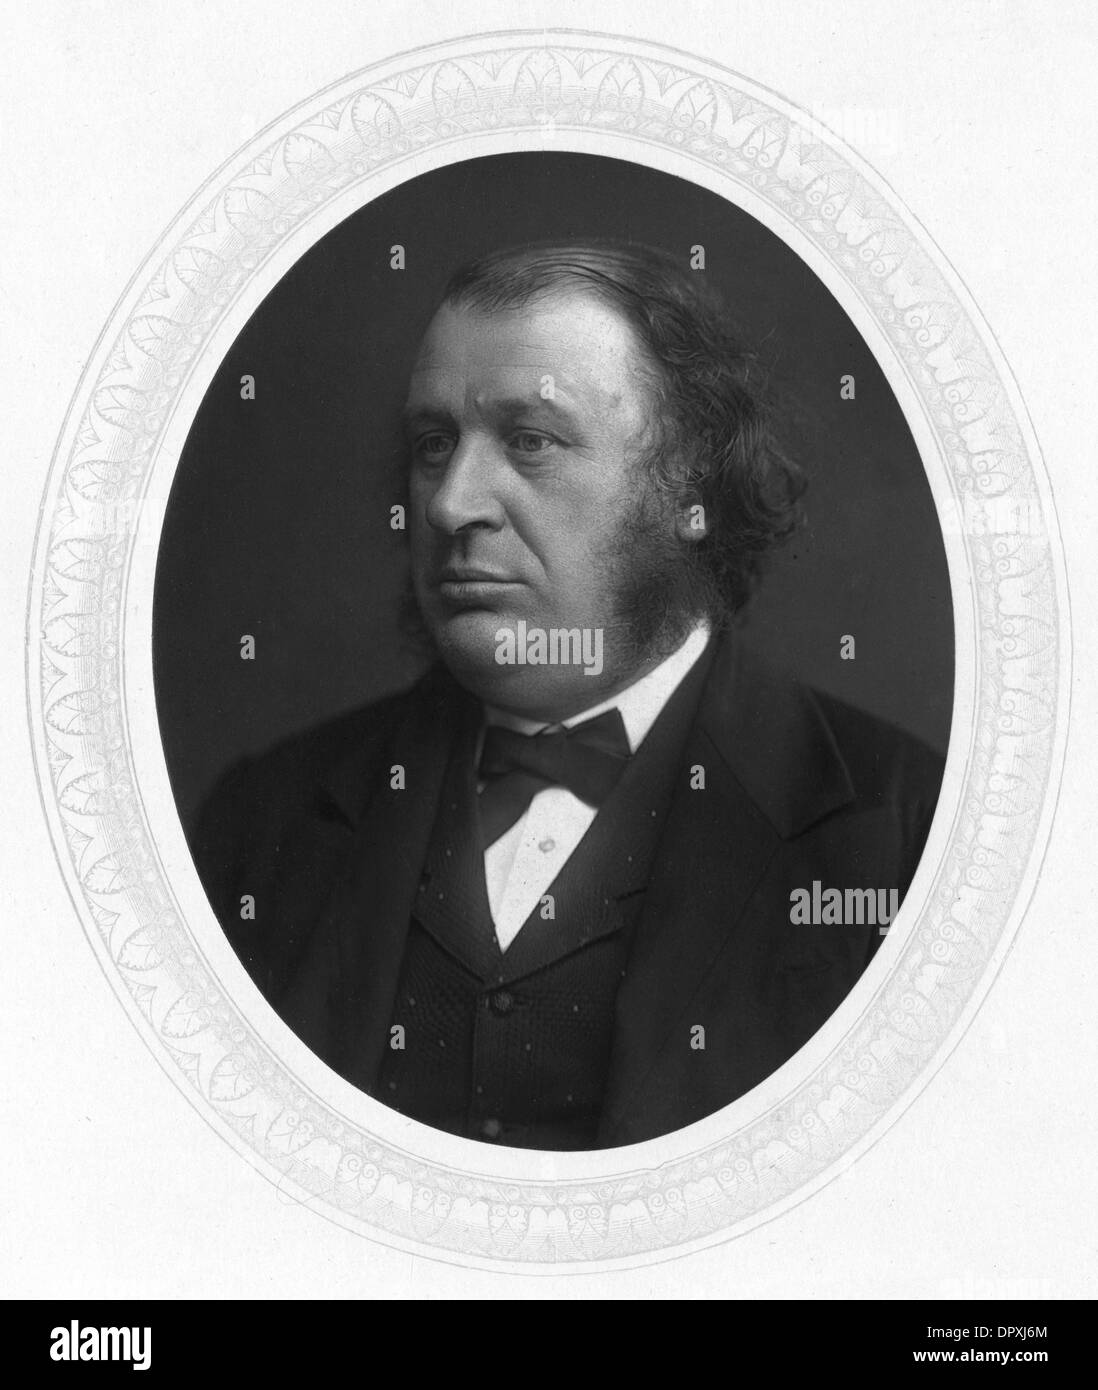 JAMES FITZJAMES STEPHEN - Stock Image